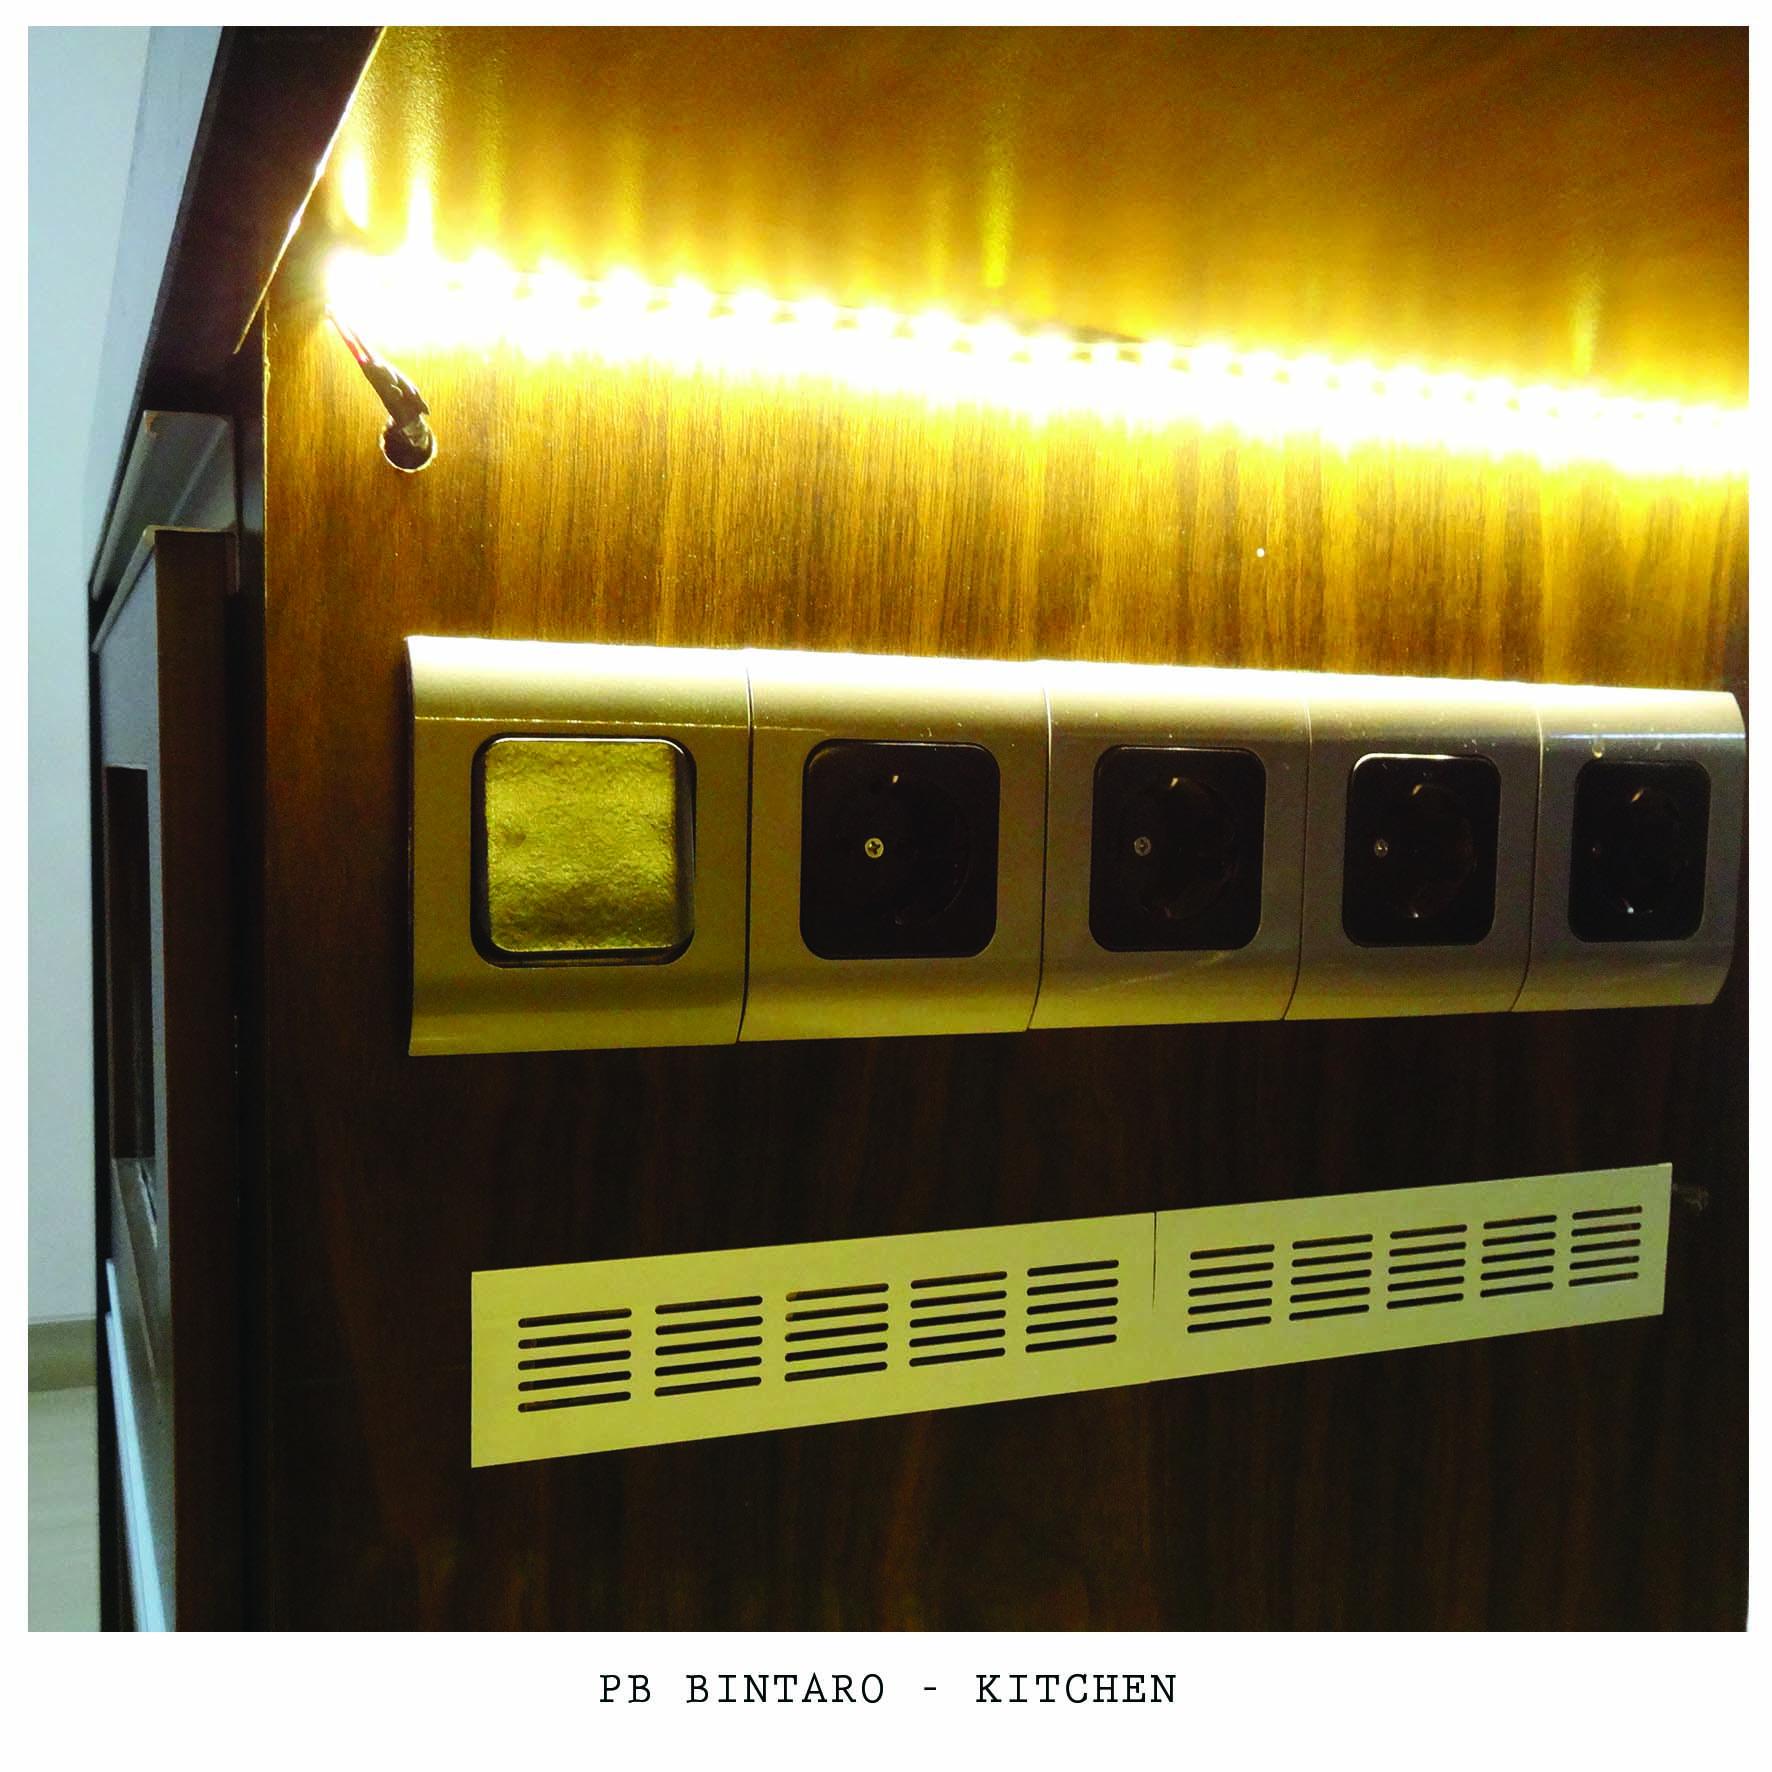 X3M Architects Pb 6 House Bintaro Bintaro X3M-Architects-Pb-6-House  75953